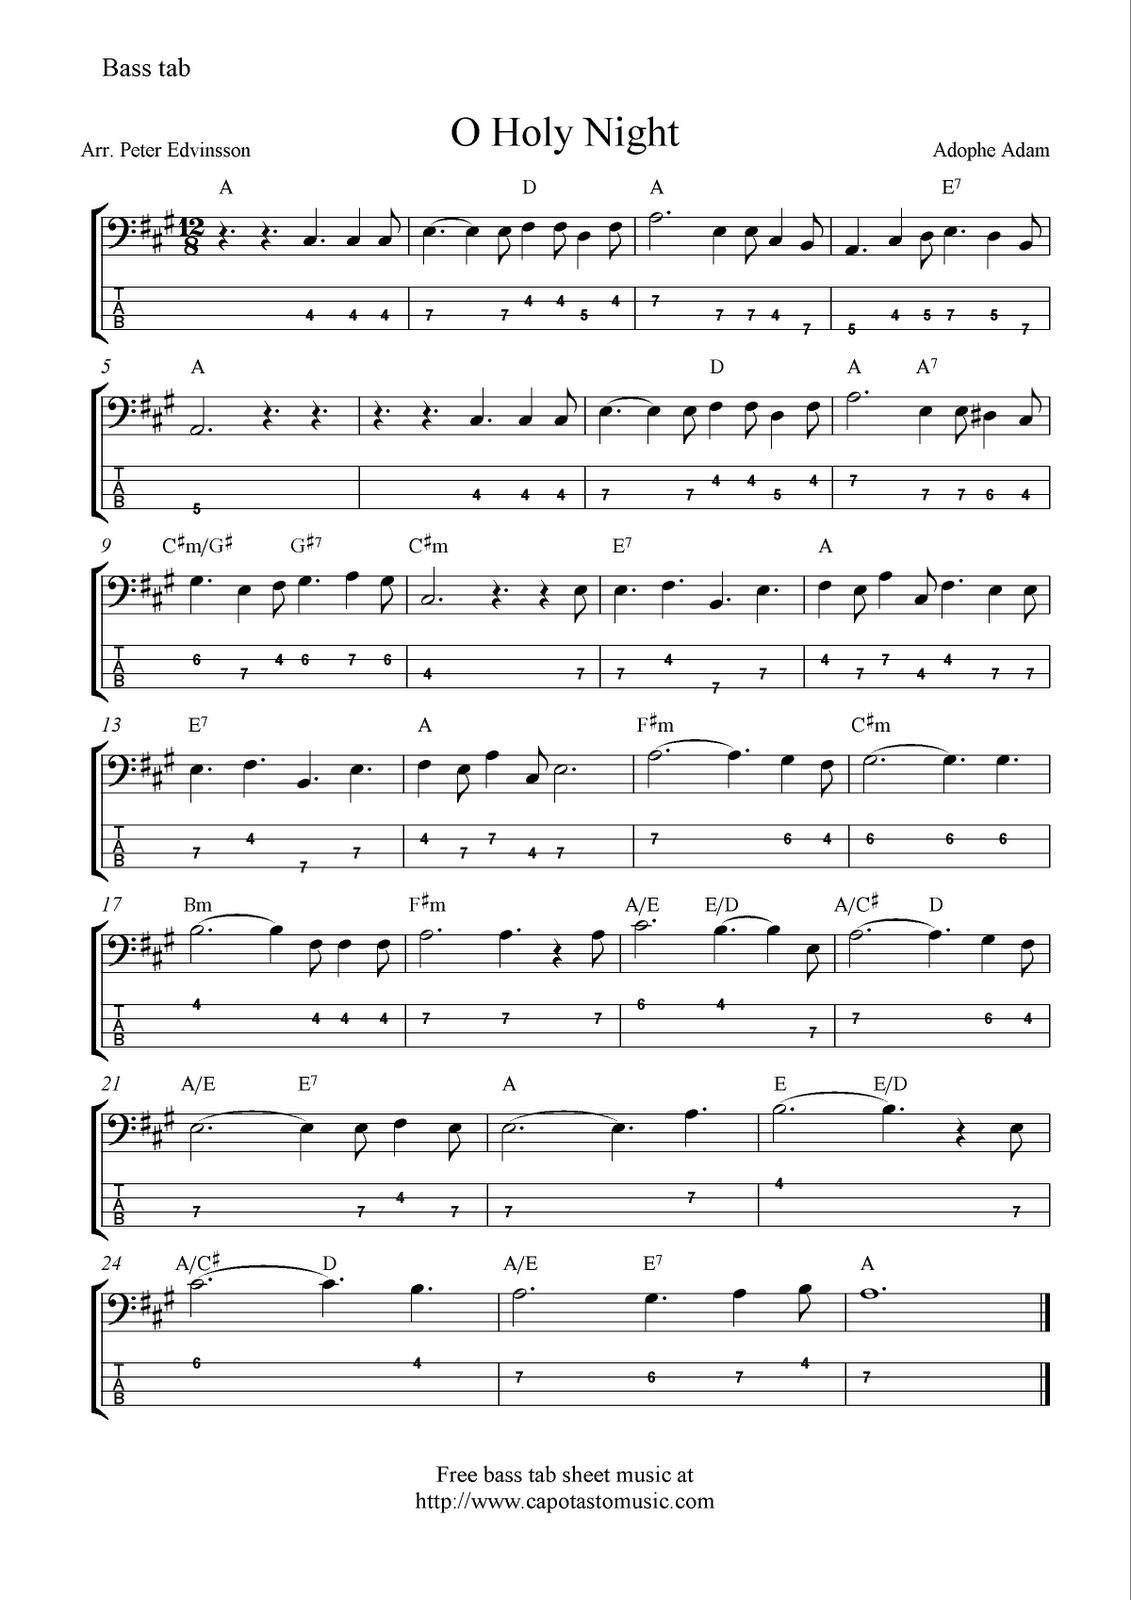 Oholynightfreechristmasbasstabsheetmusicnotesg 1131 bass hexwebz Choice Image